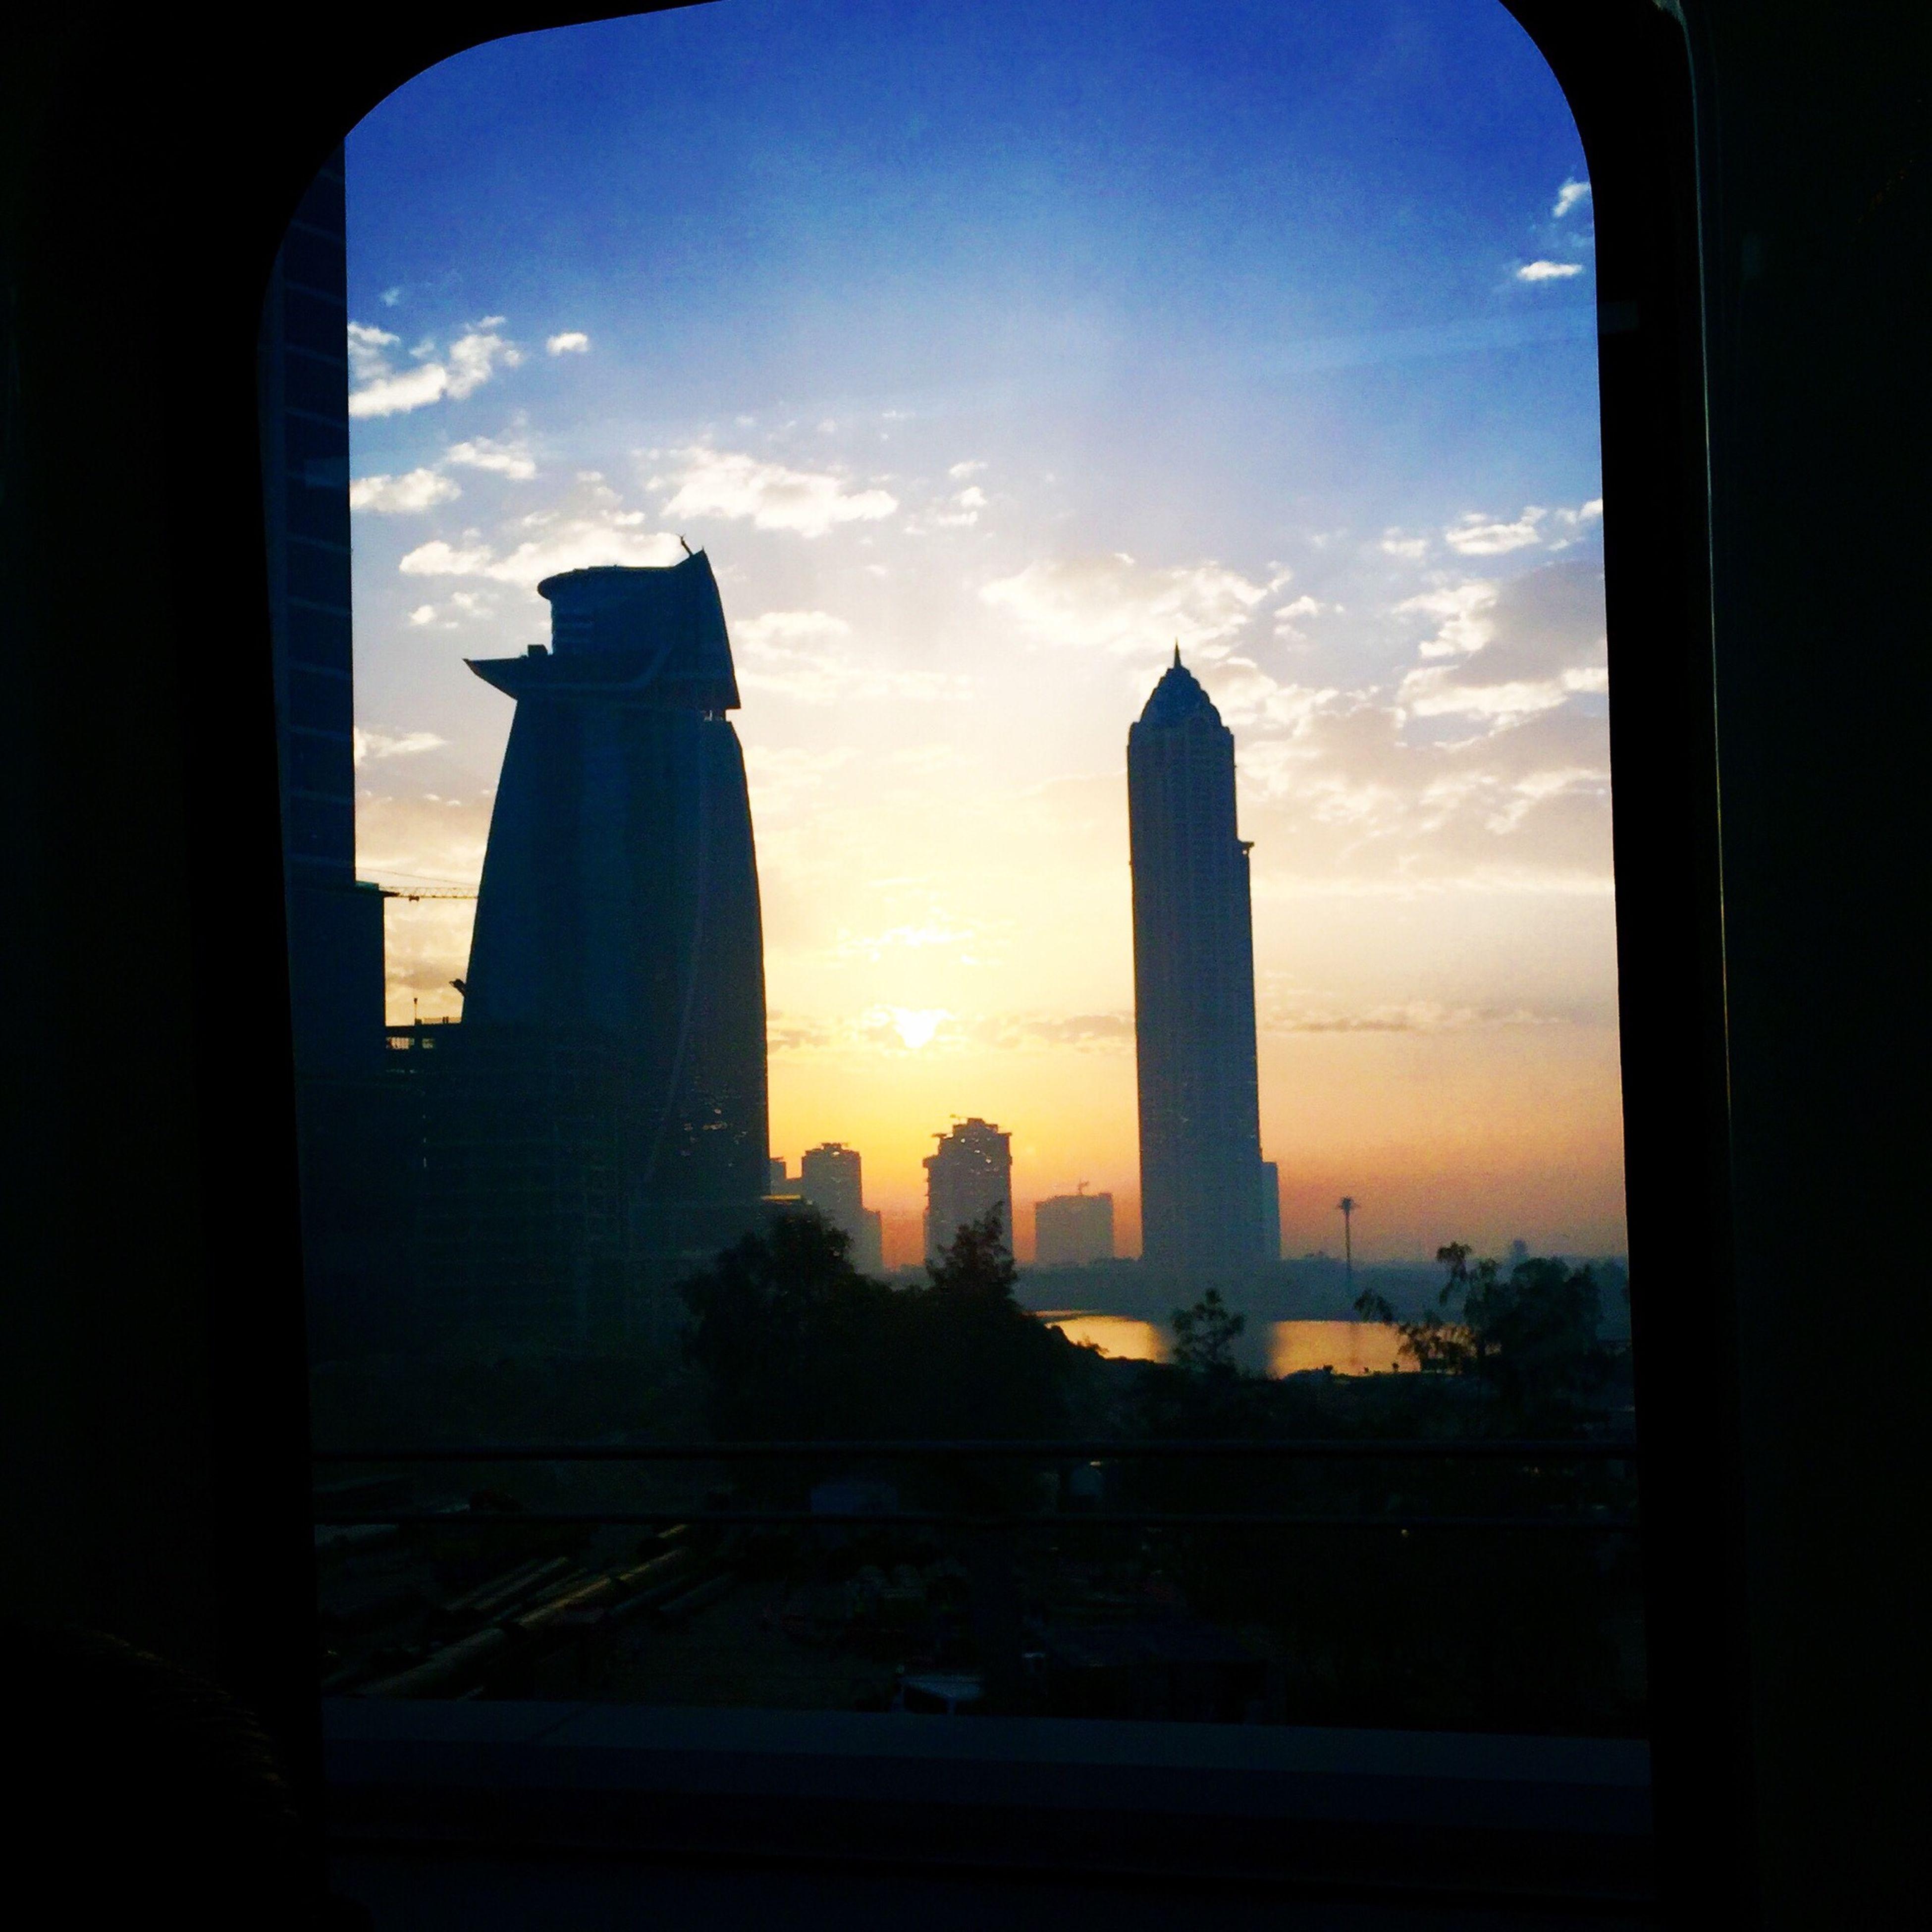 architecture, built structure, building exterior, sky, sunset, city, silhouette, skyscraper, cityscape, tower, famous place, indoors, travel destinations, cloud - sky, tall - high, capital cities, travel, international landmark, tourism, cloud